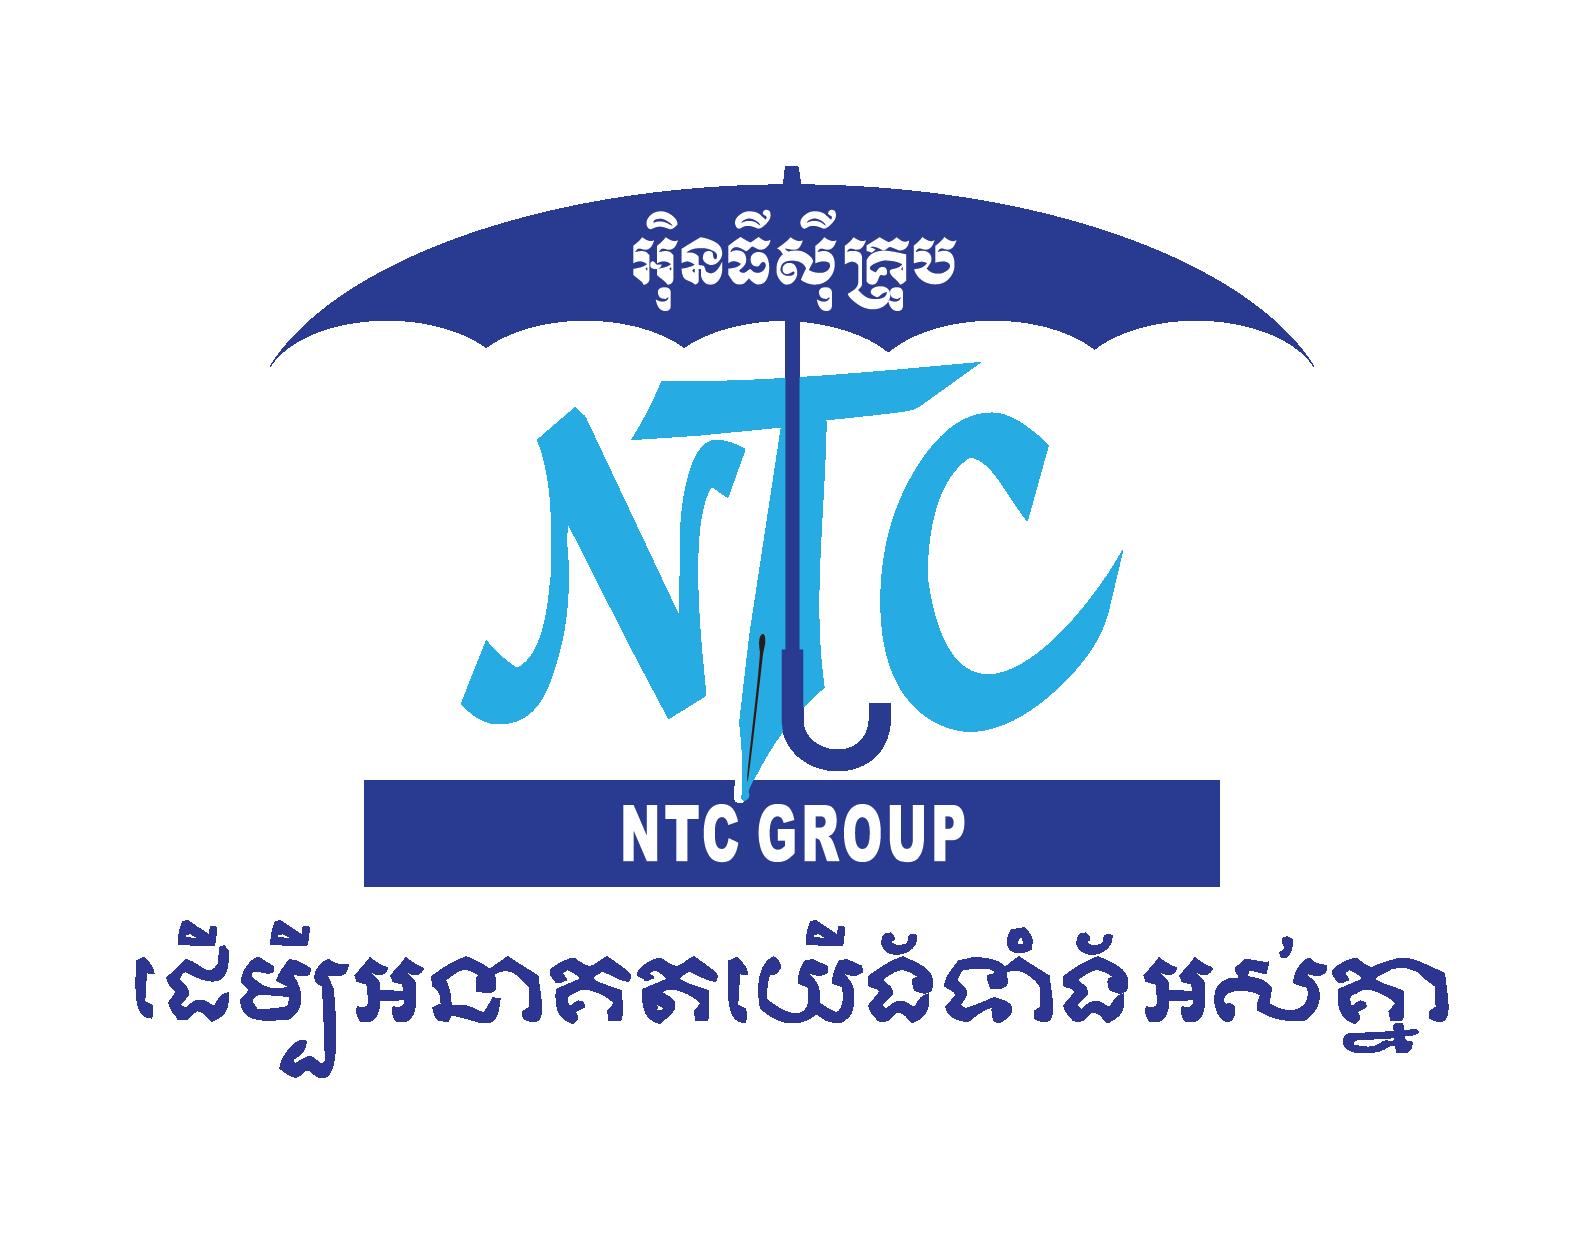 NTC Group